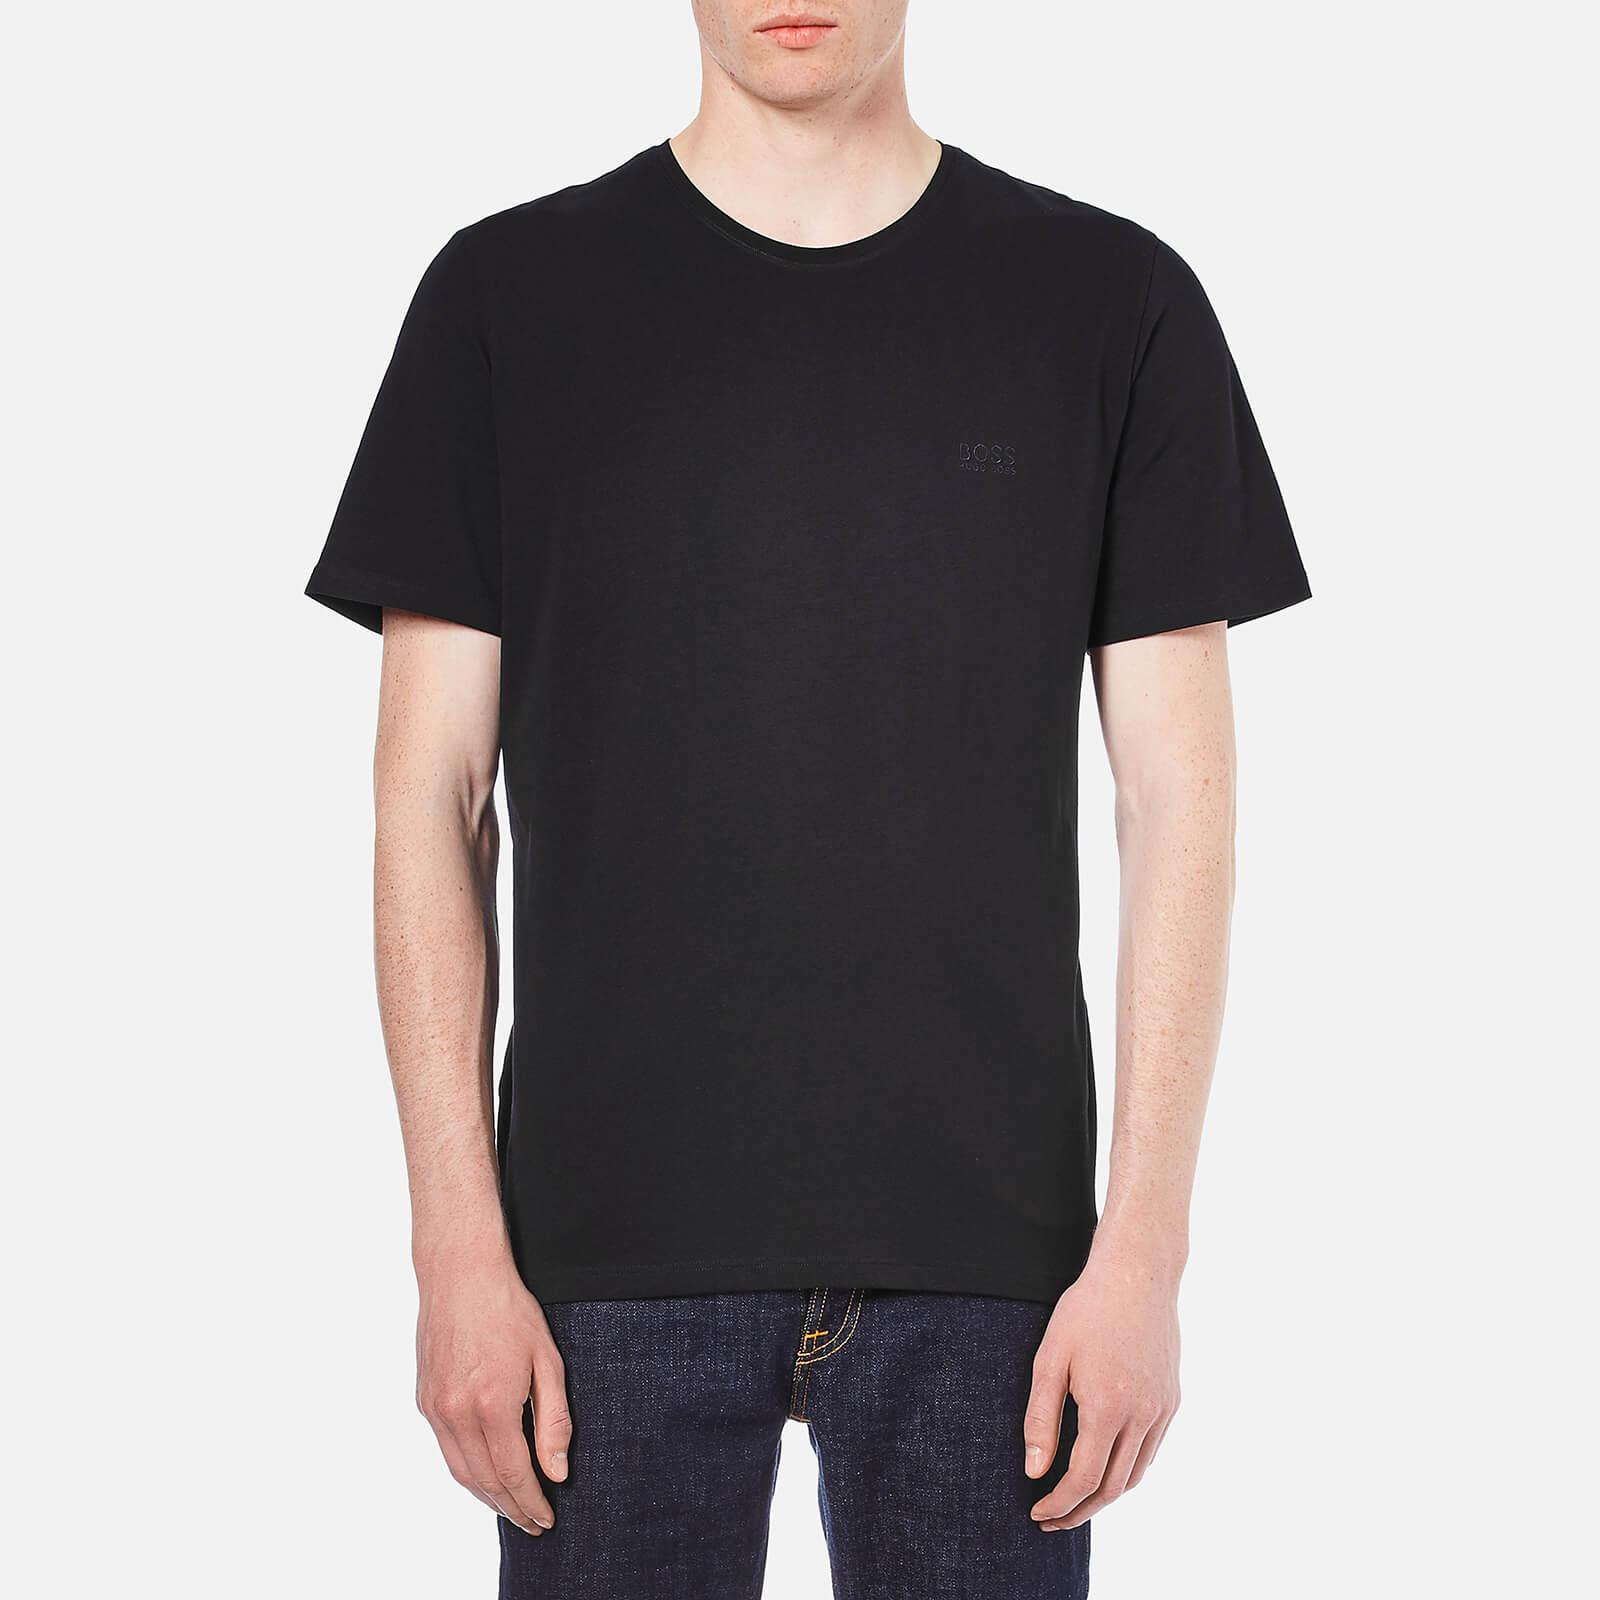 62a1b28b4 BOSS Hugo Boss Men's Crew Neck Small Logo T-Shirt - Black Clothing |  TheHut.com